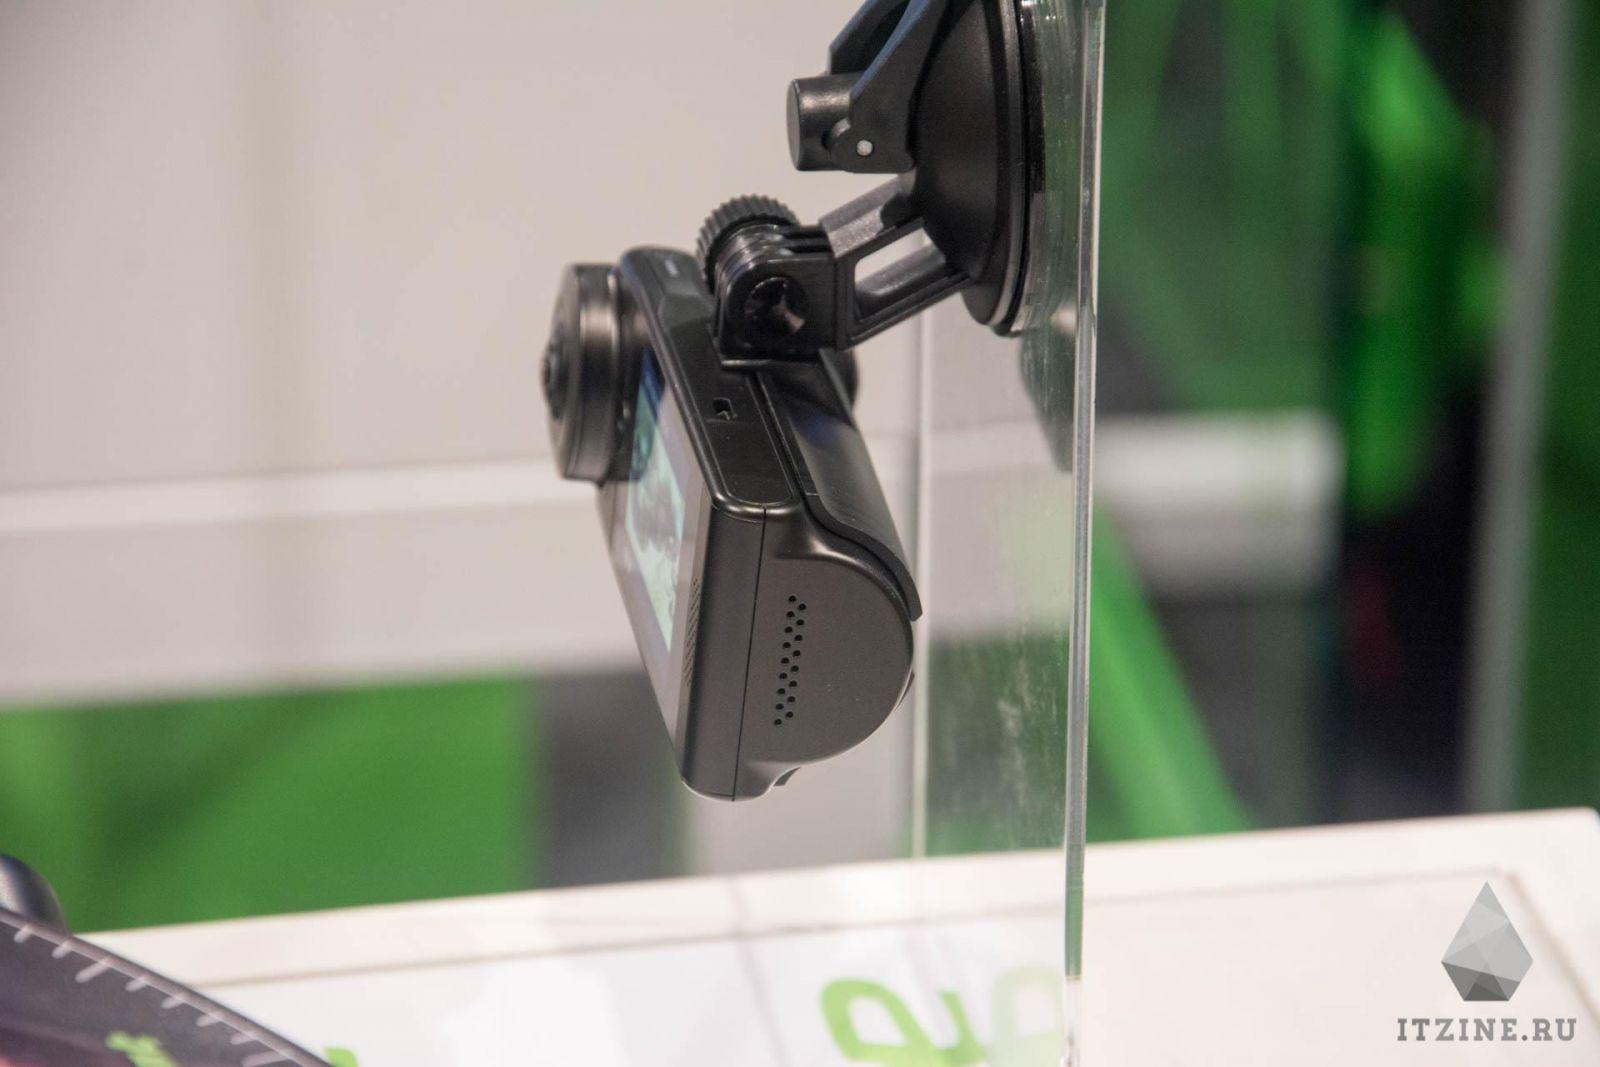 DSC 4256 - IFA 2017. Acer представила камеры «Acer all-in-one 360», которые могут соединяться по LTE